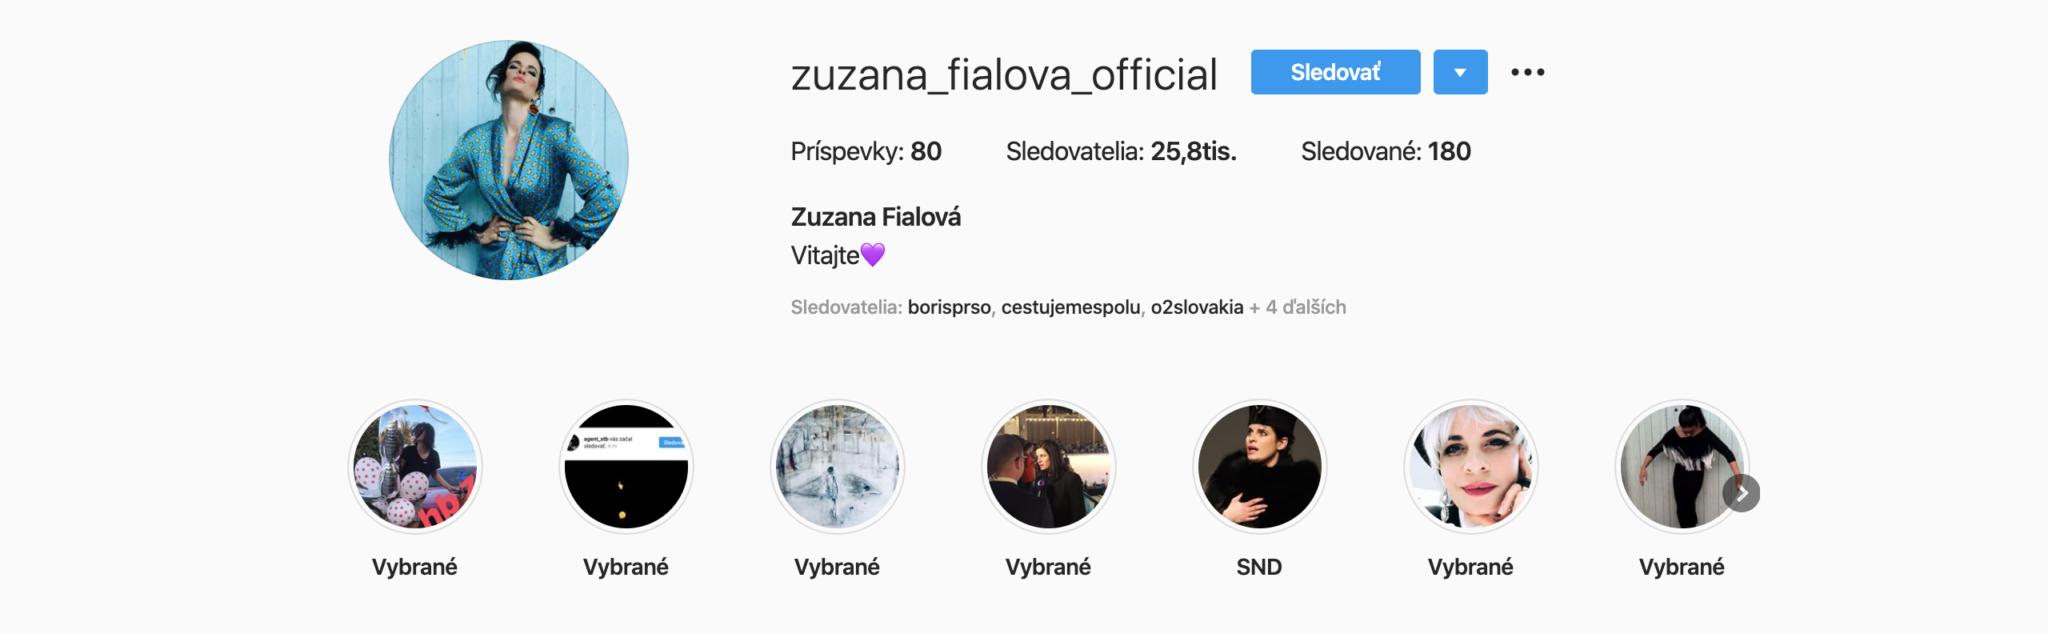 Zuzana Fialová, Instagram